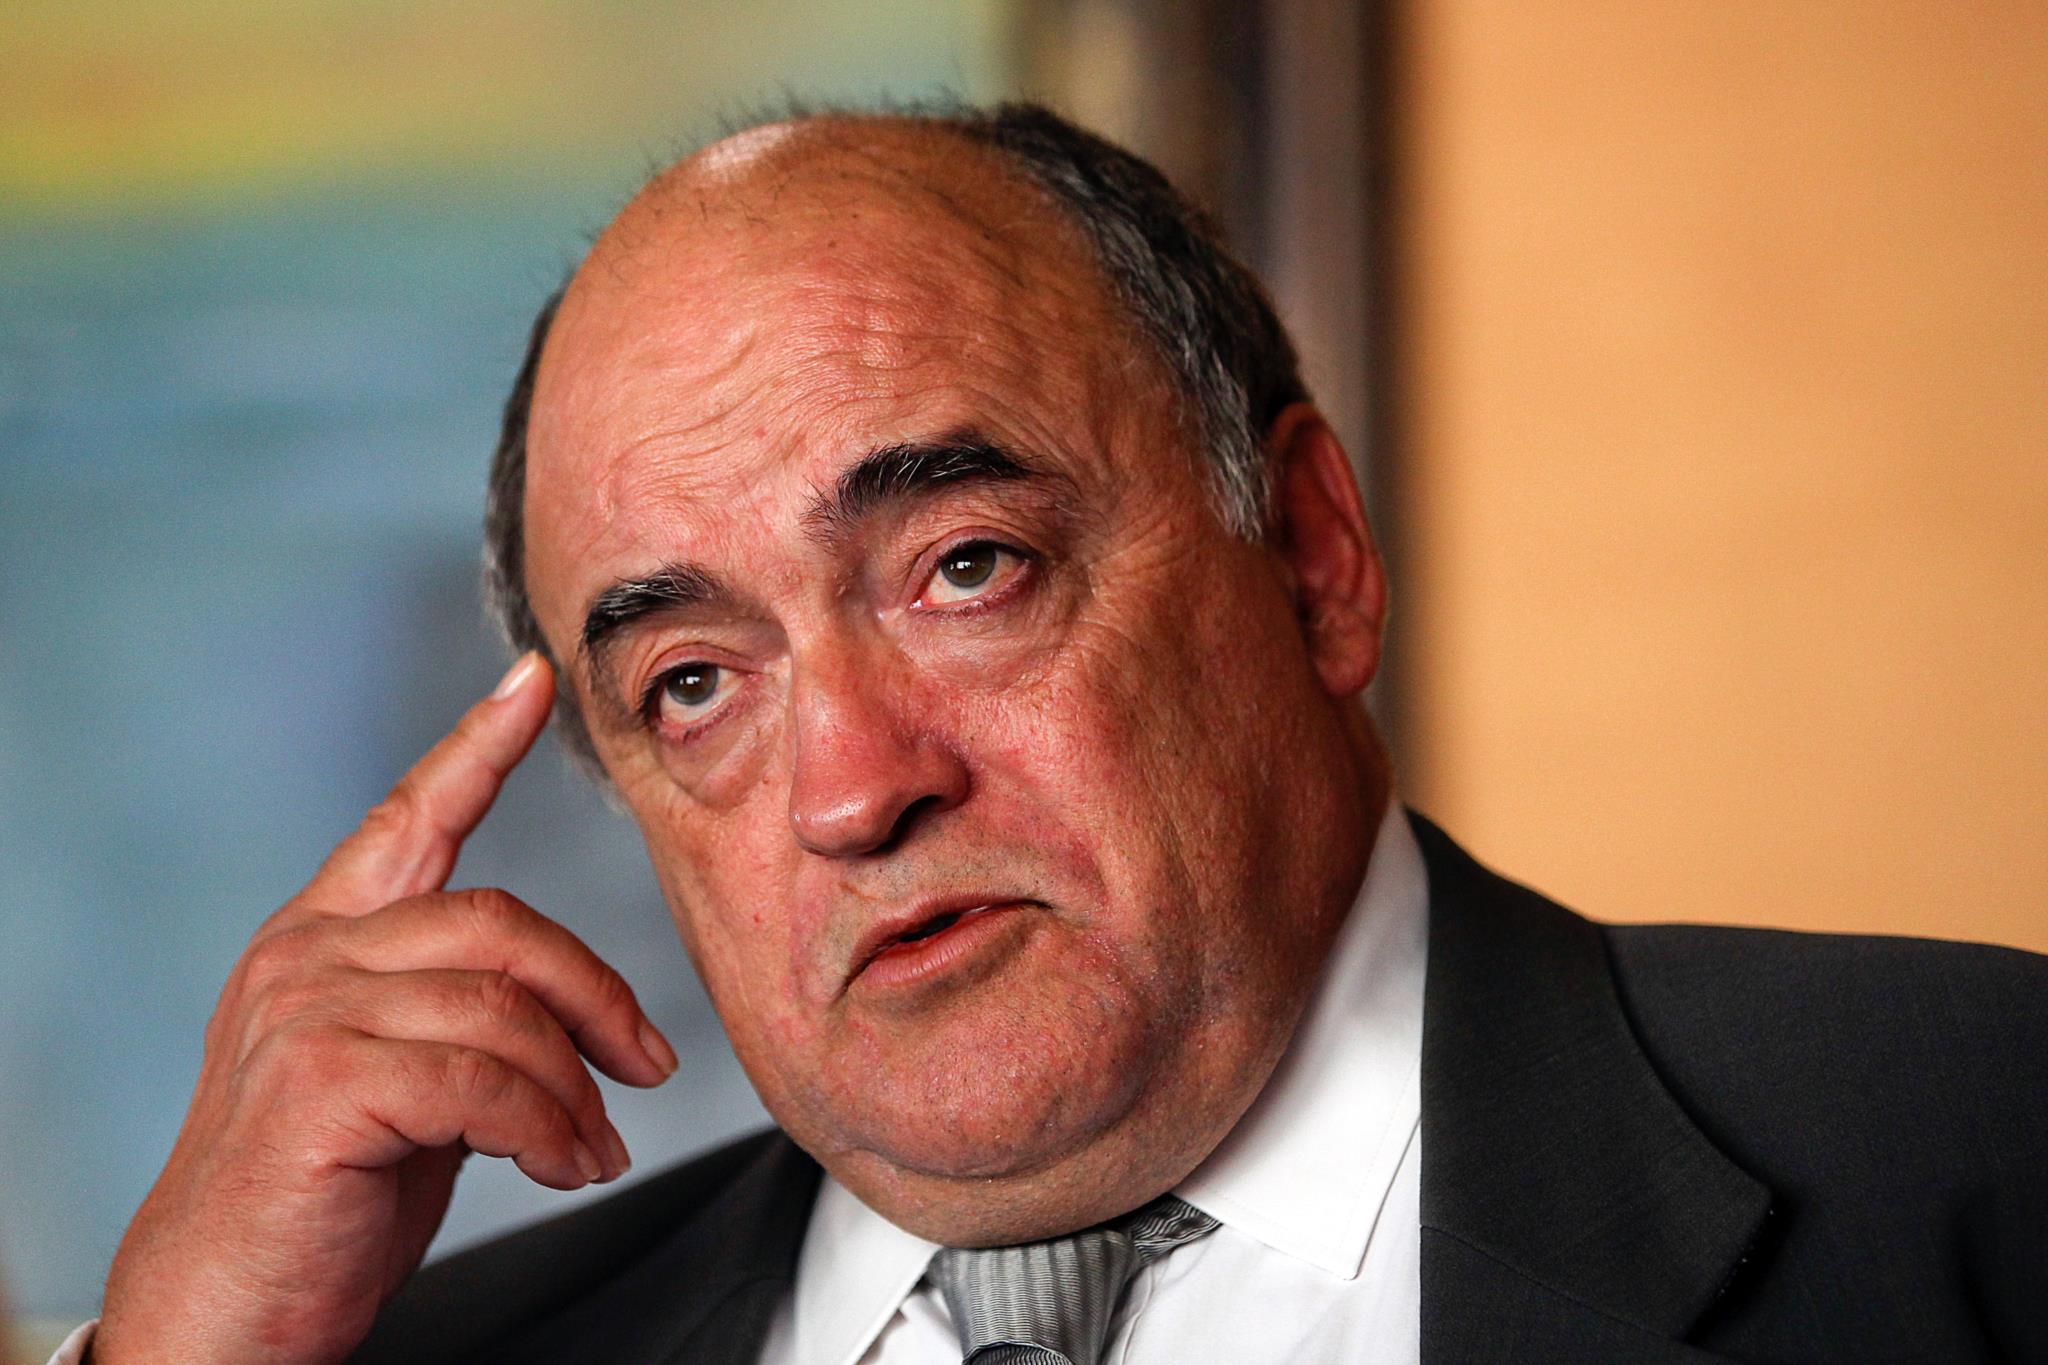 PÚBLICO - Morreu o ex-ministro Miguel Beleza